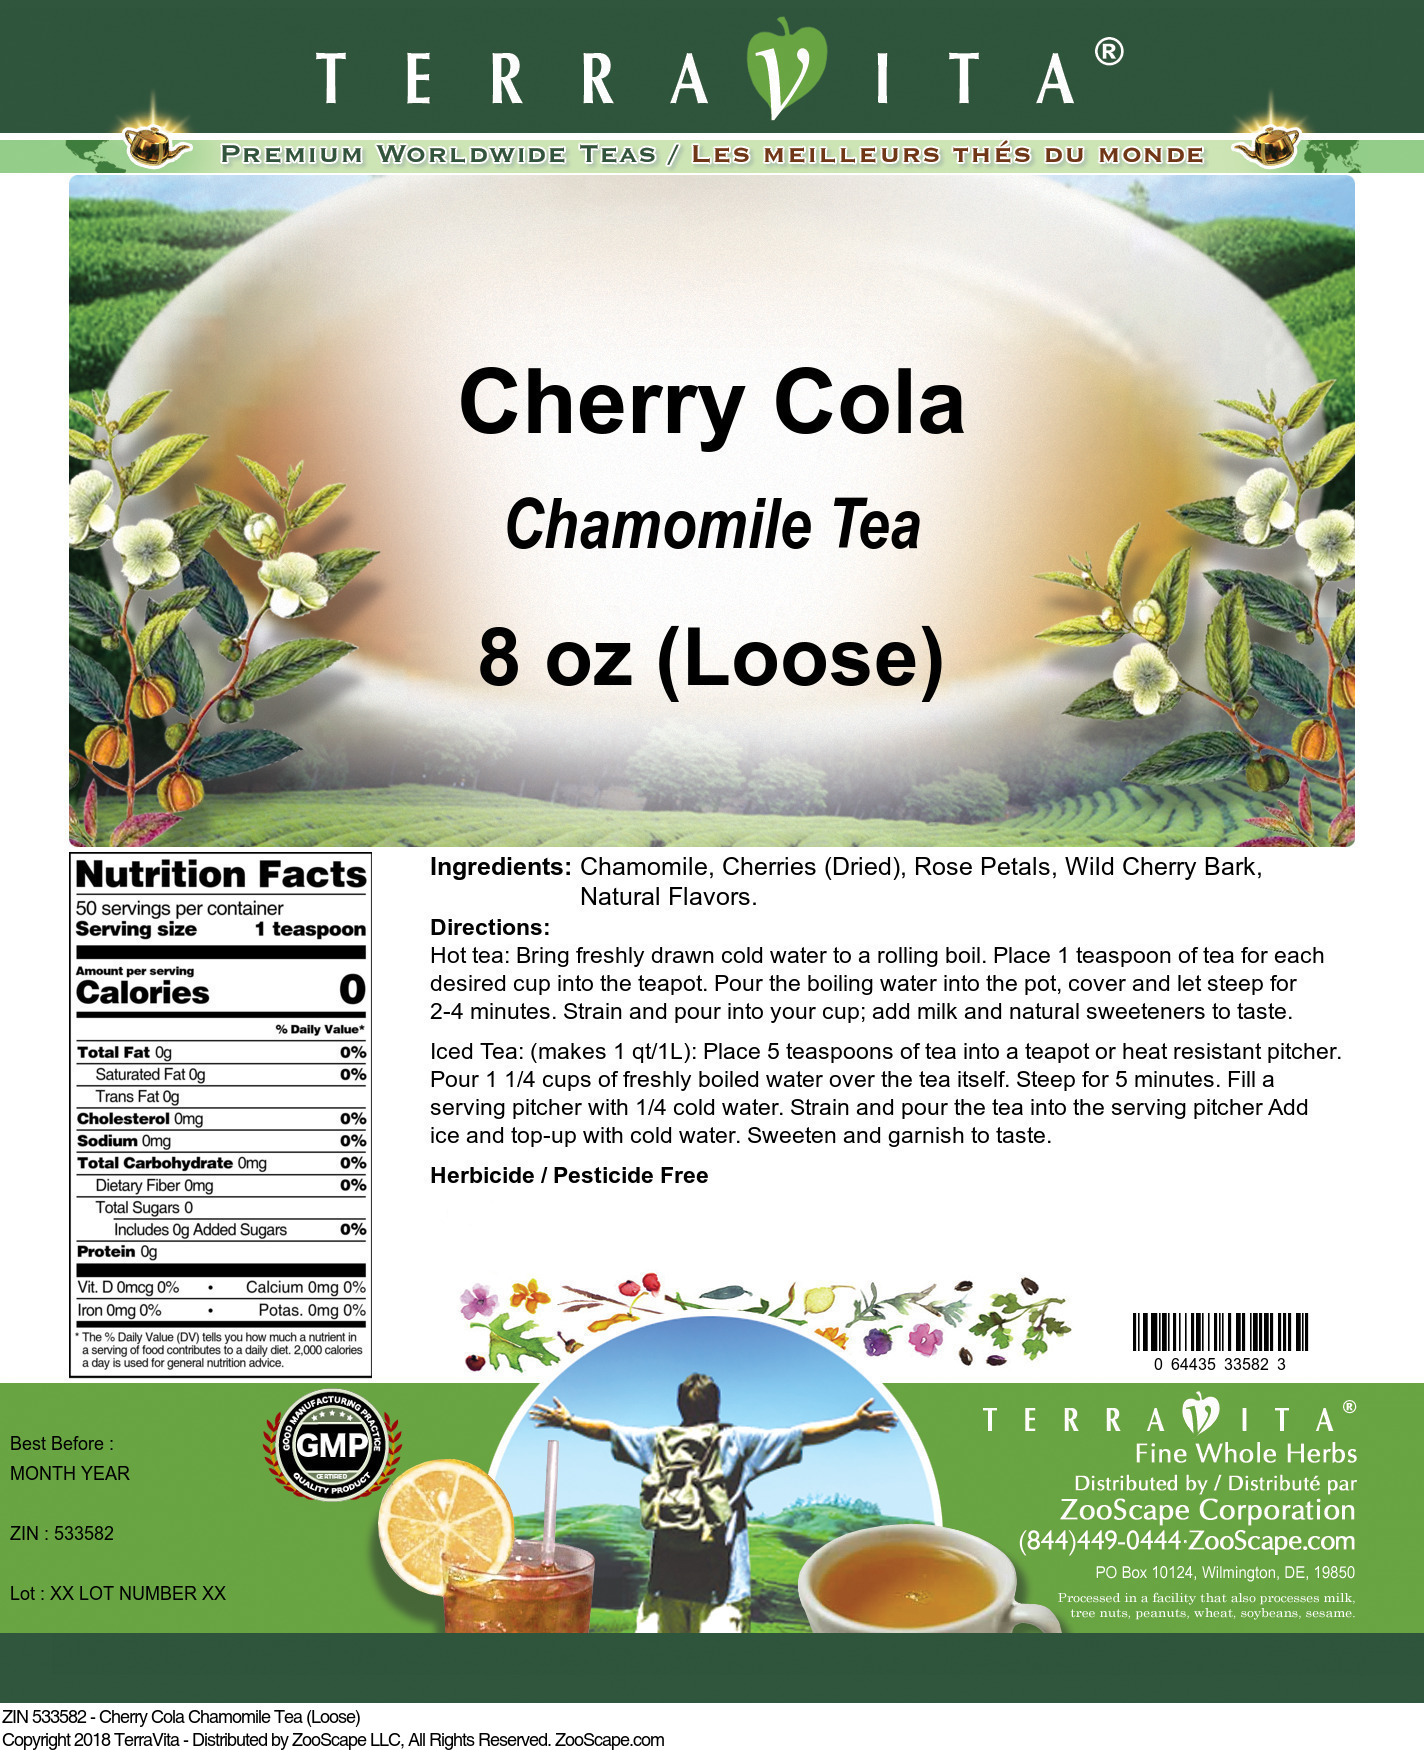 Cherry Cola Chamomile Tea (Loose)